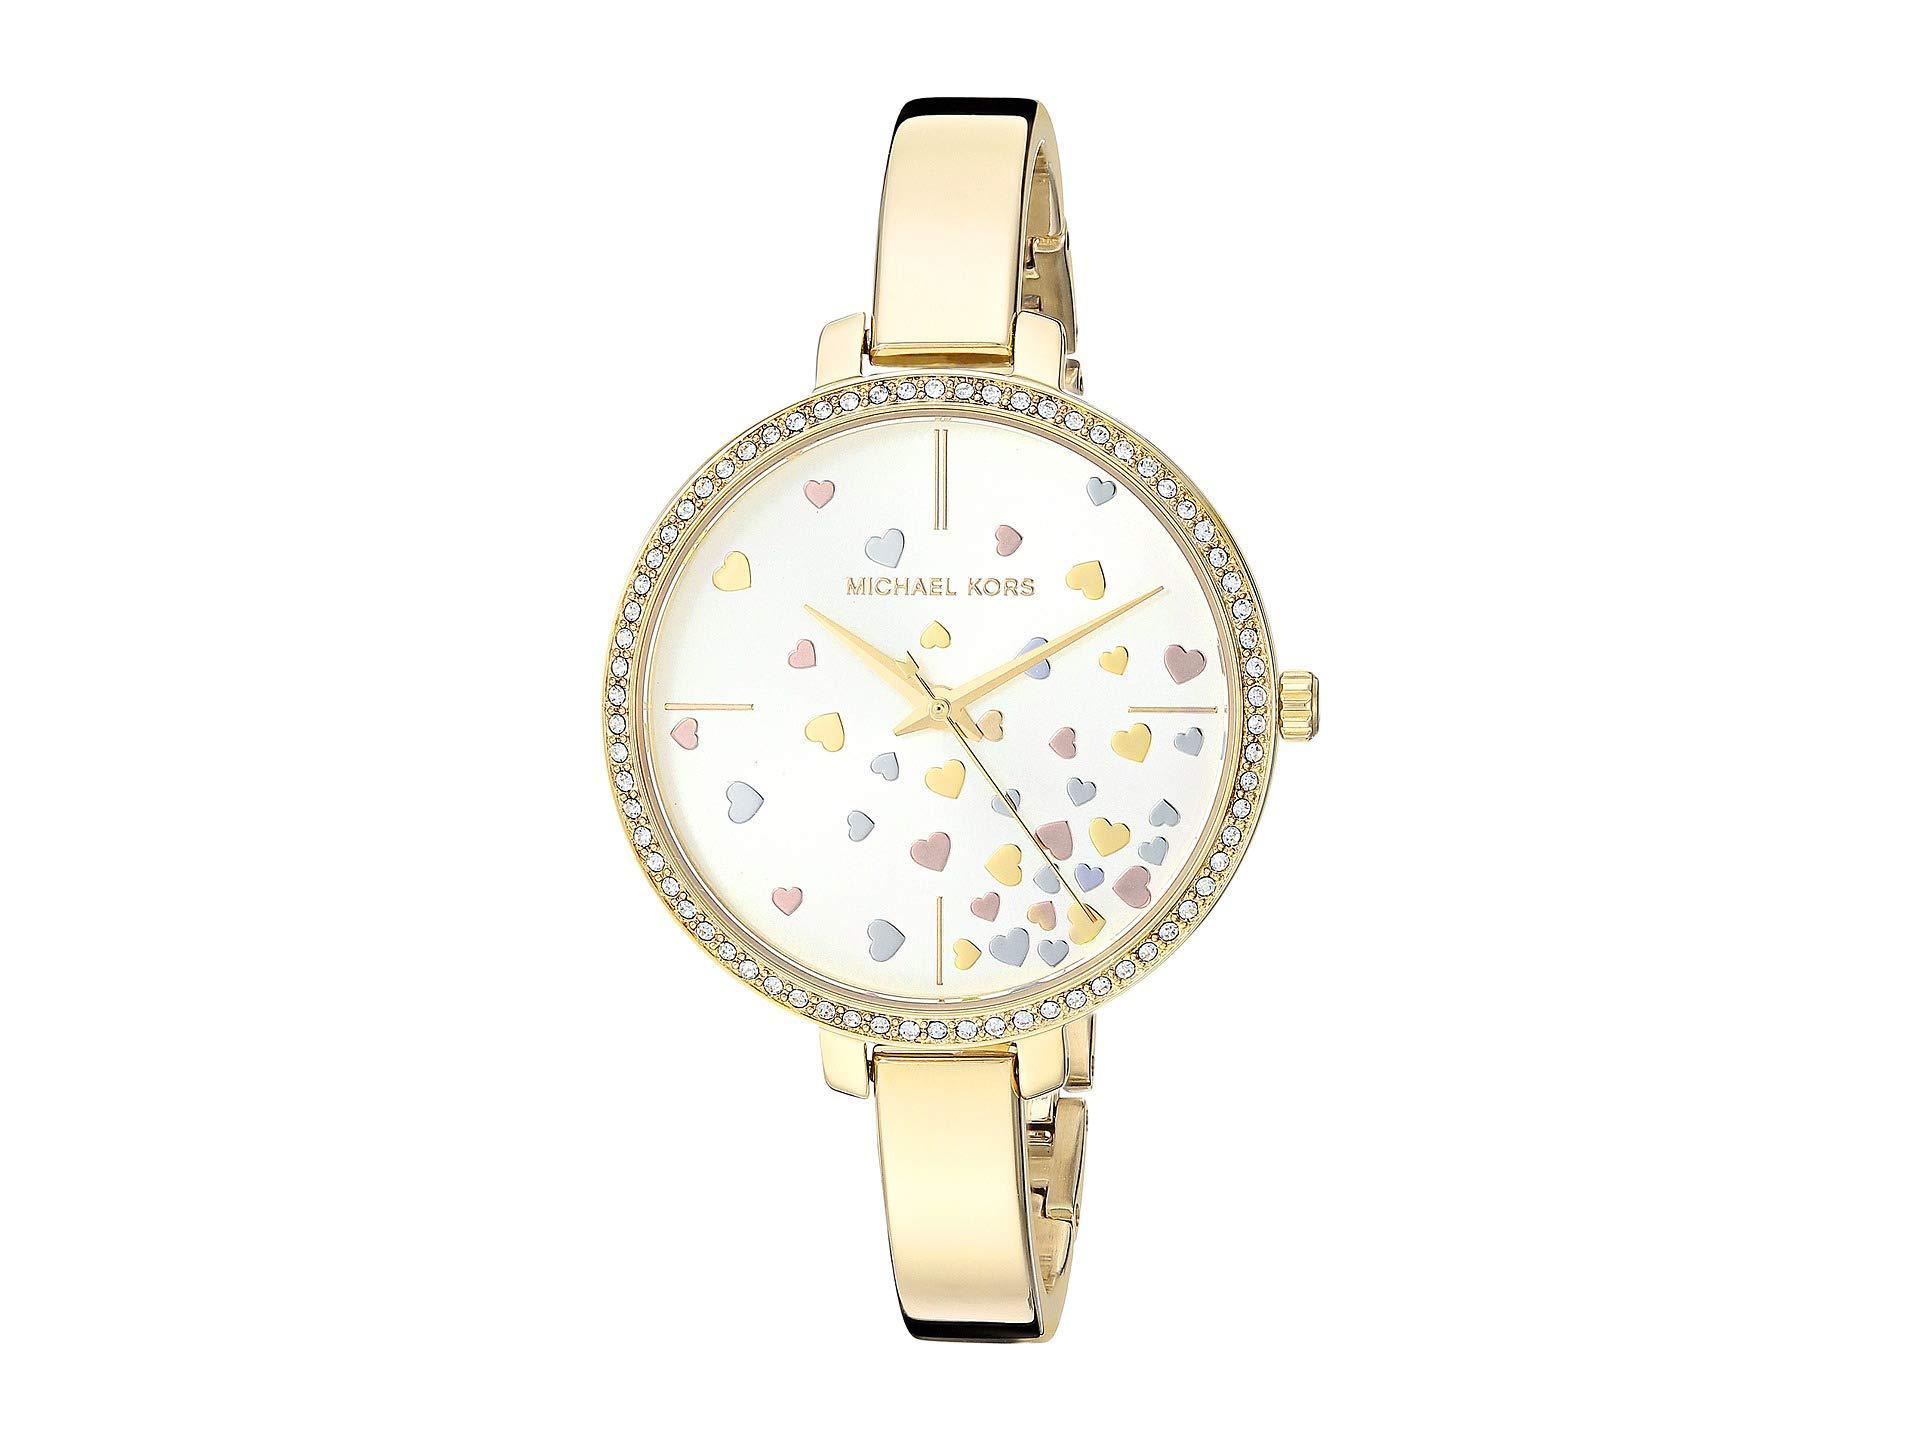 Lyst Michael Kors Mk3977 Jaryn Gold Watches In Metallic Fossil Idealist Silver Es4194 Gallery